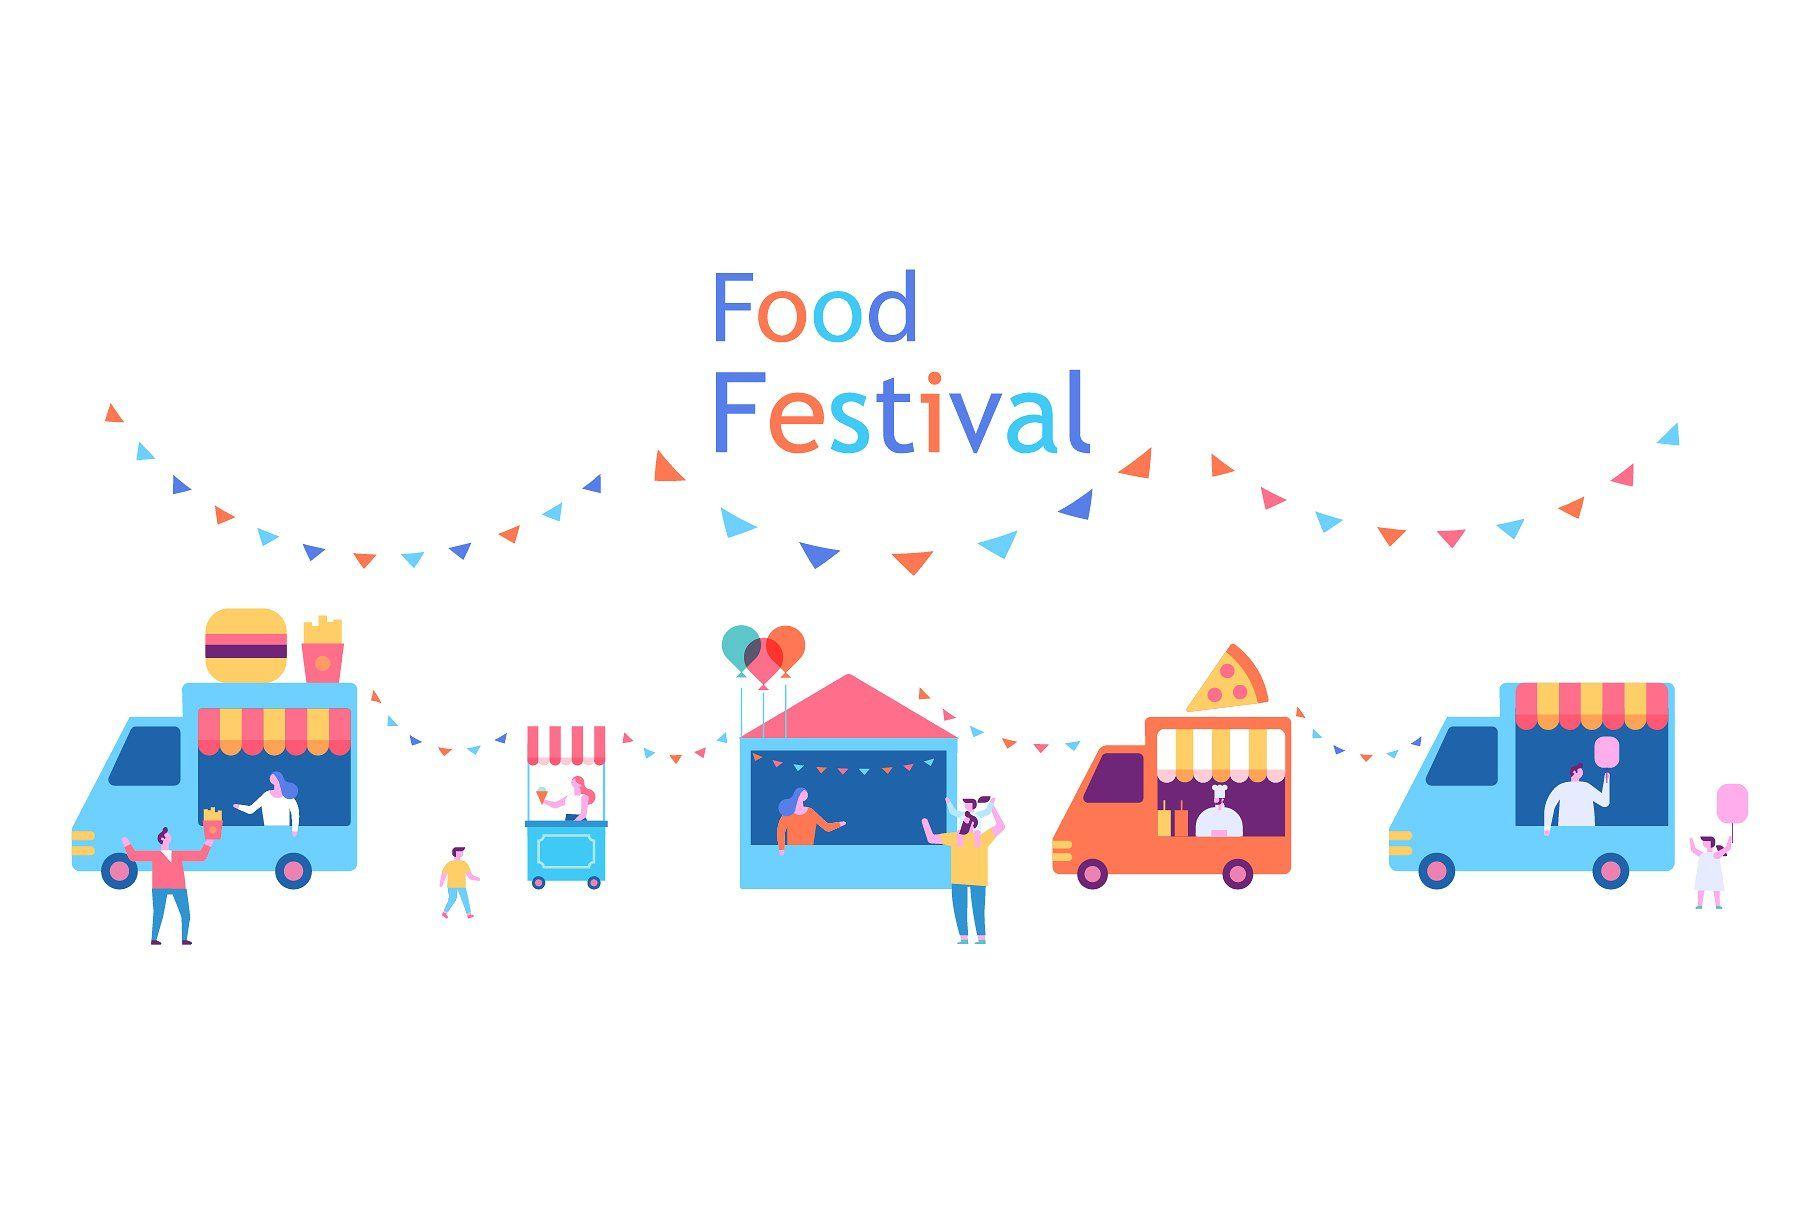 Summer Food Festival Background Food Festival Festival Background Summer Recipes